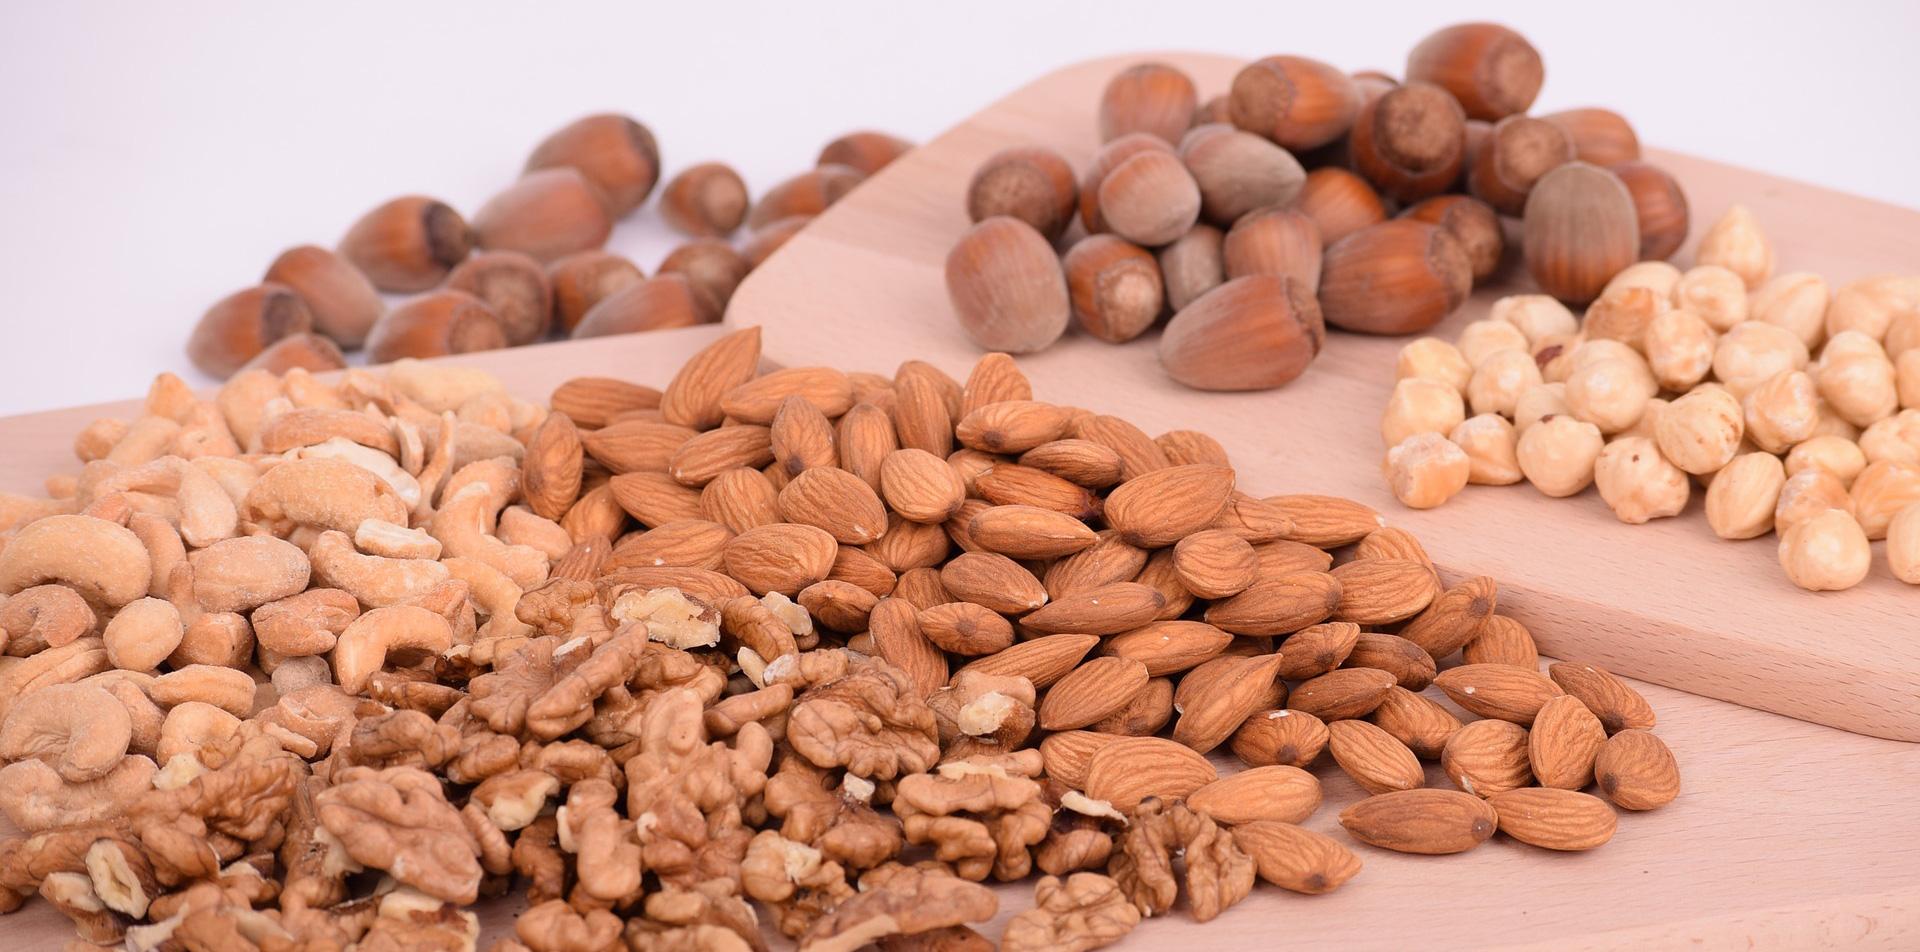 Protein fra nødder sundere end kødprotein